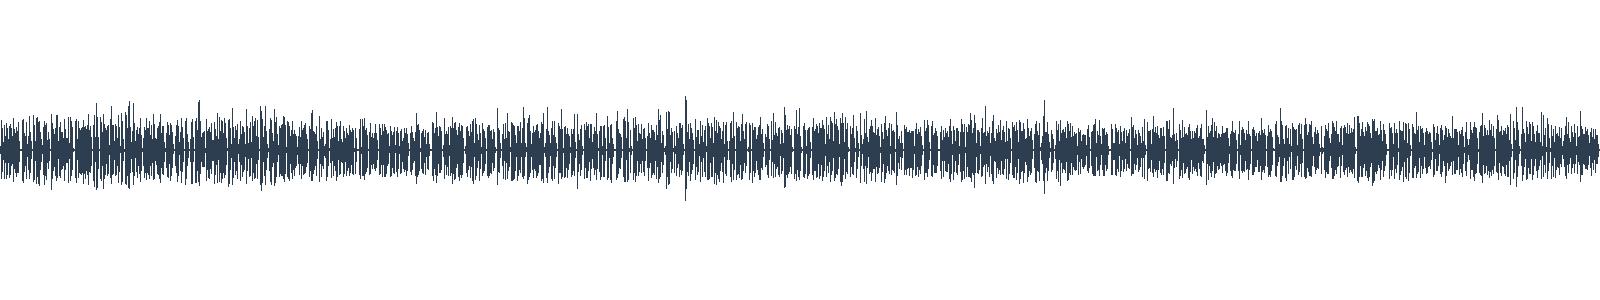 Historie a vznik Slevomatu waveform